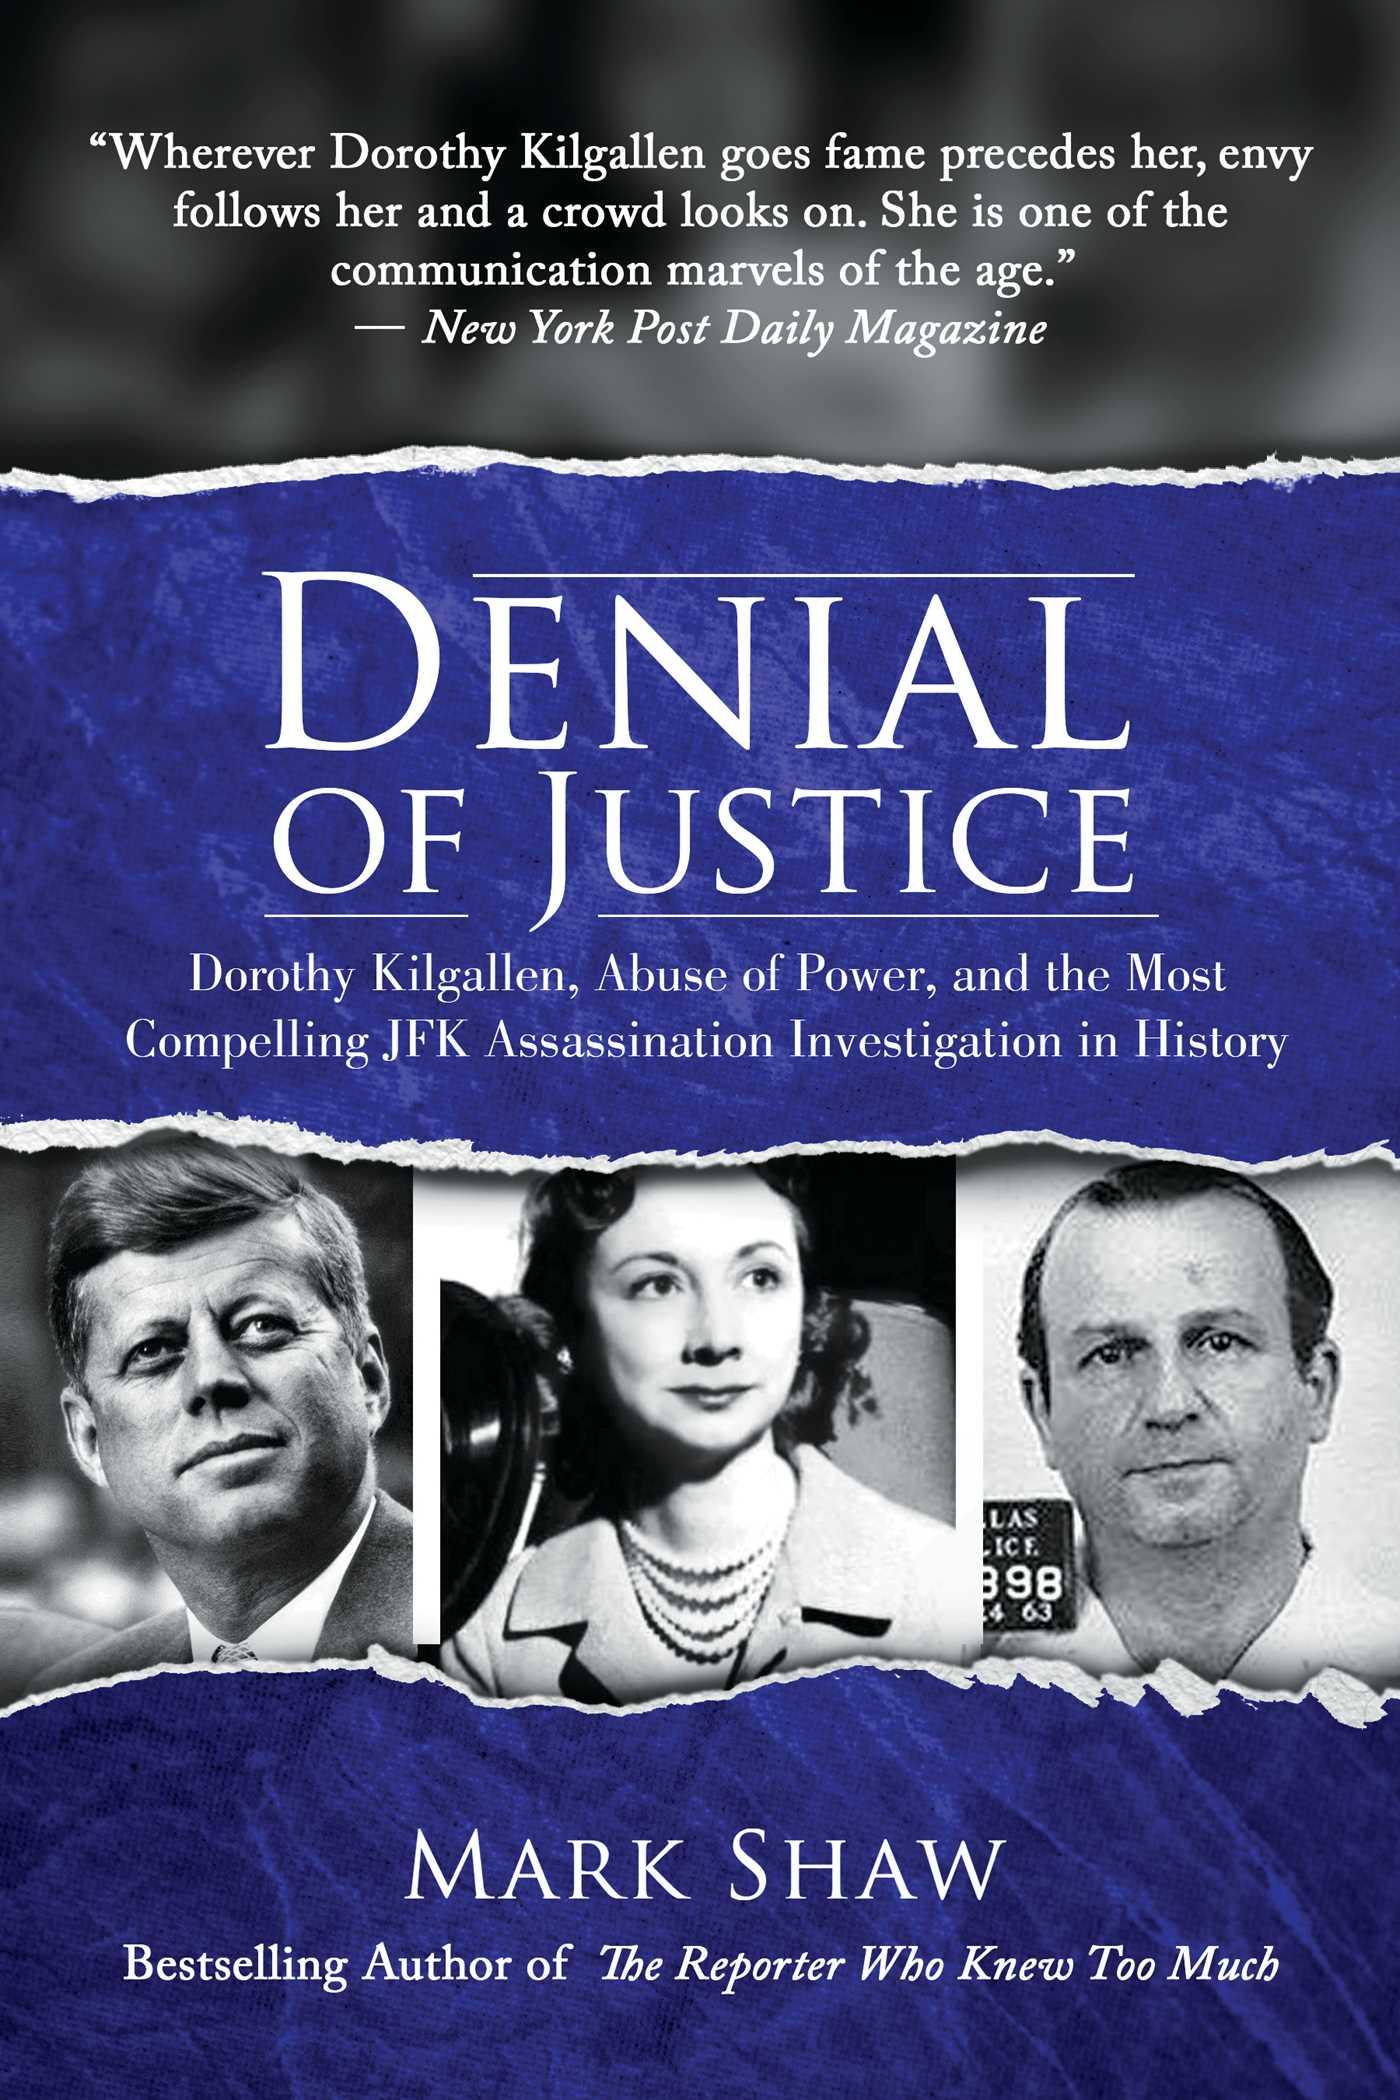 Denial of justice 9781642930580 hr